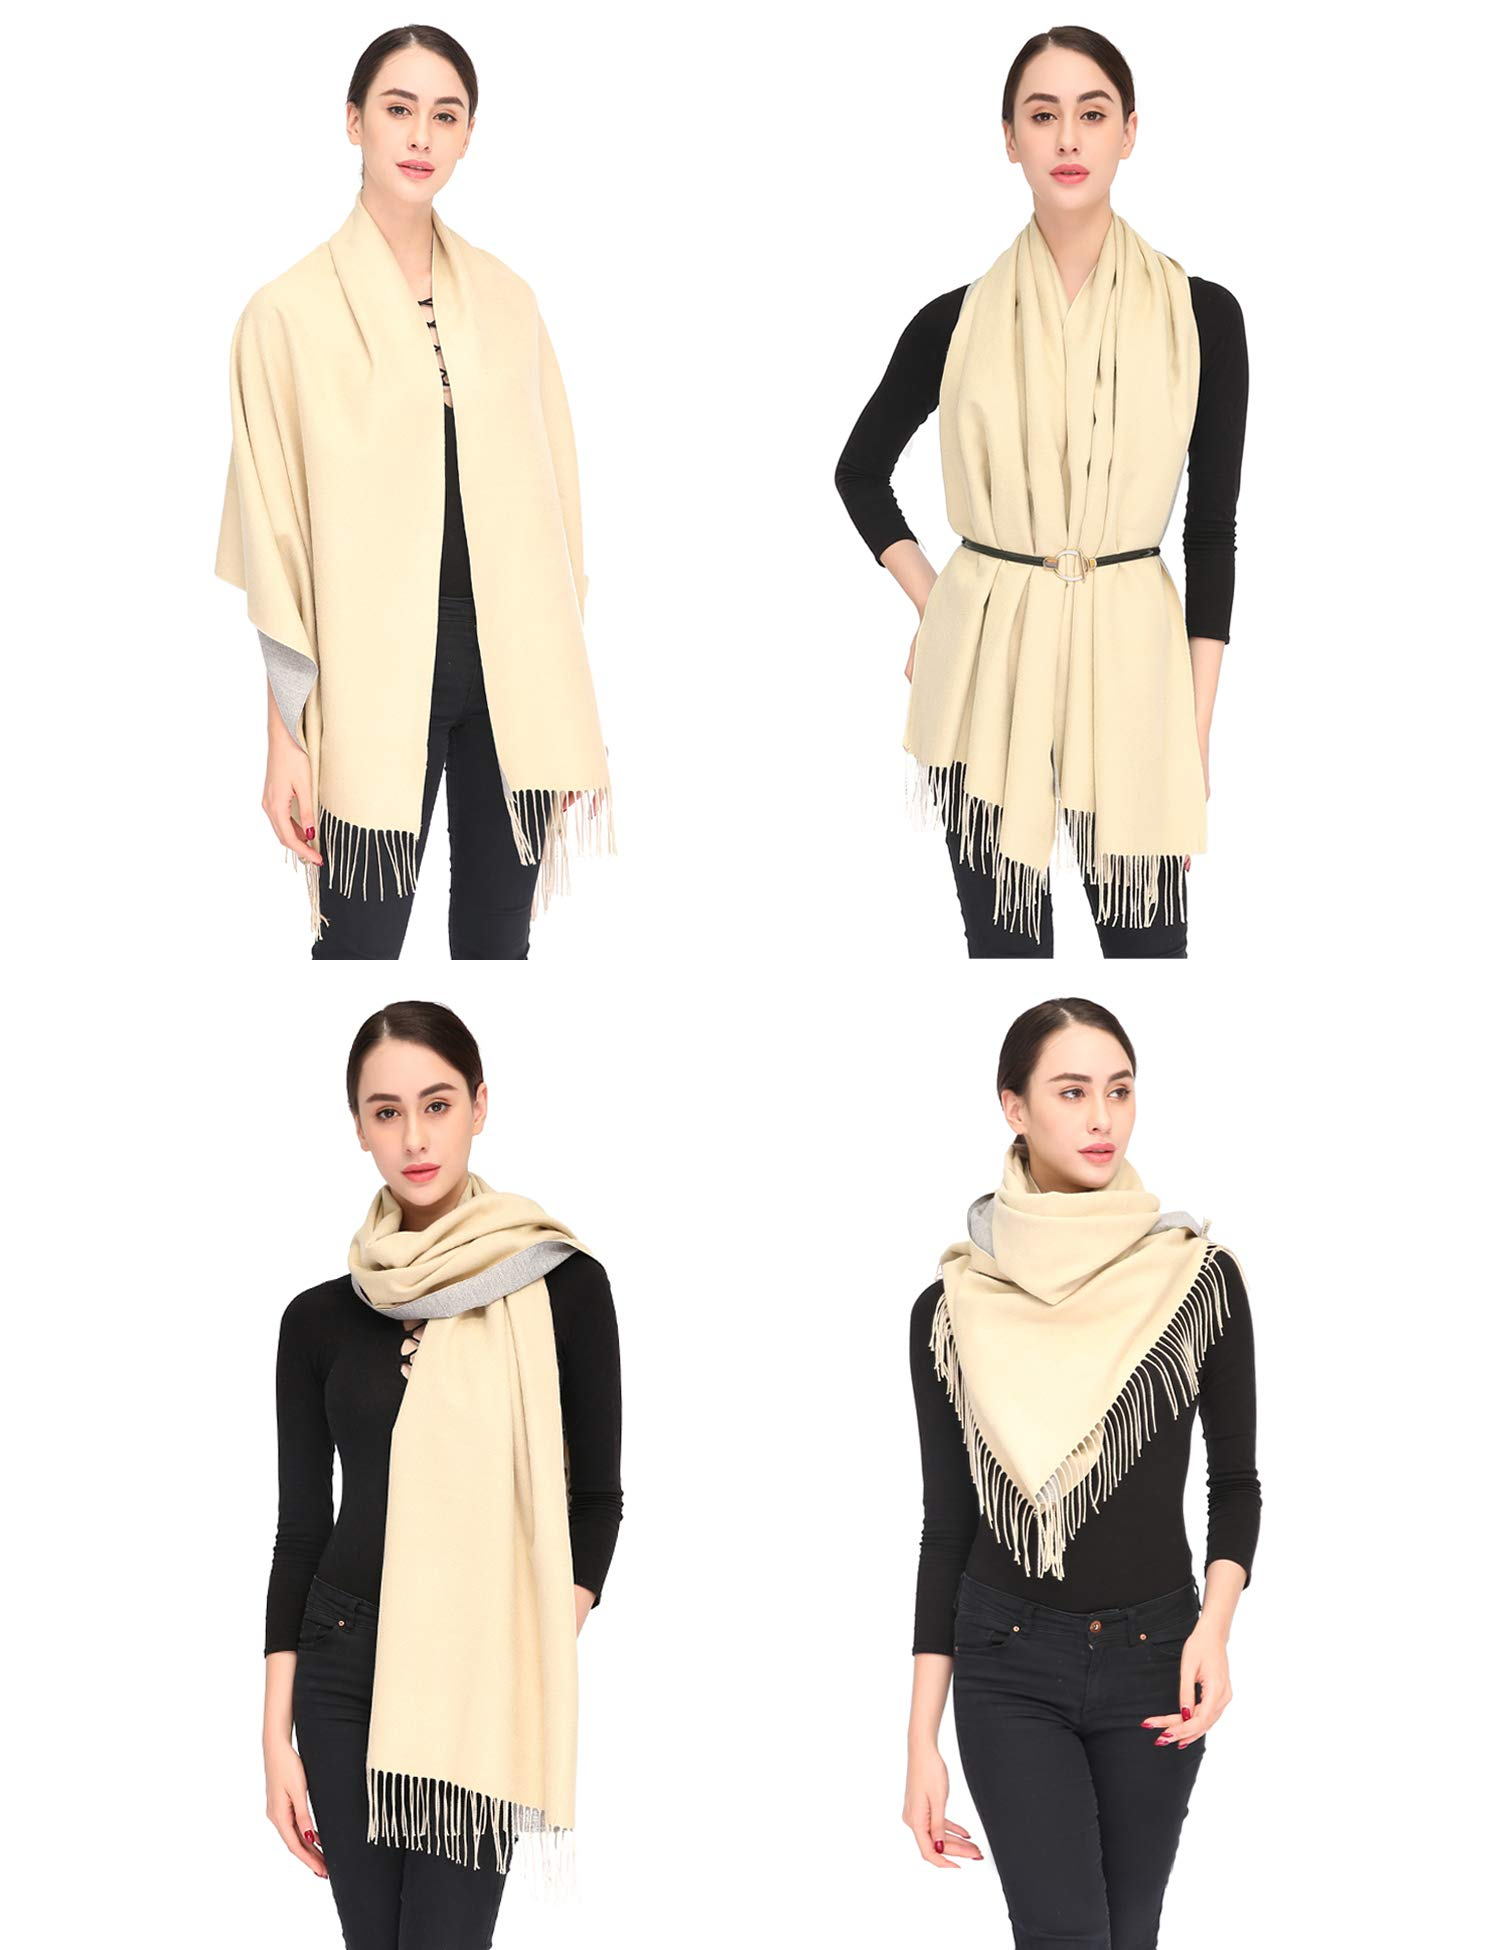 Luxuriously Soft Large Winter Scarves GIft Box Women Stylish Warm Blanket Scarf Solid Oversized Pashmina Cashmere Shawl Wrap Scarves 75''x25.5'' (Beige/Grey, Box) by Arctic Penguin (Image #5)